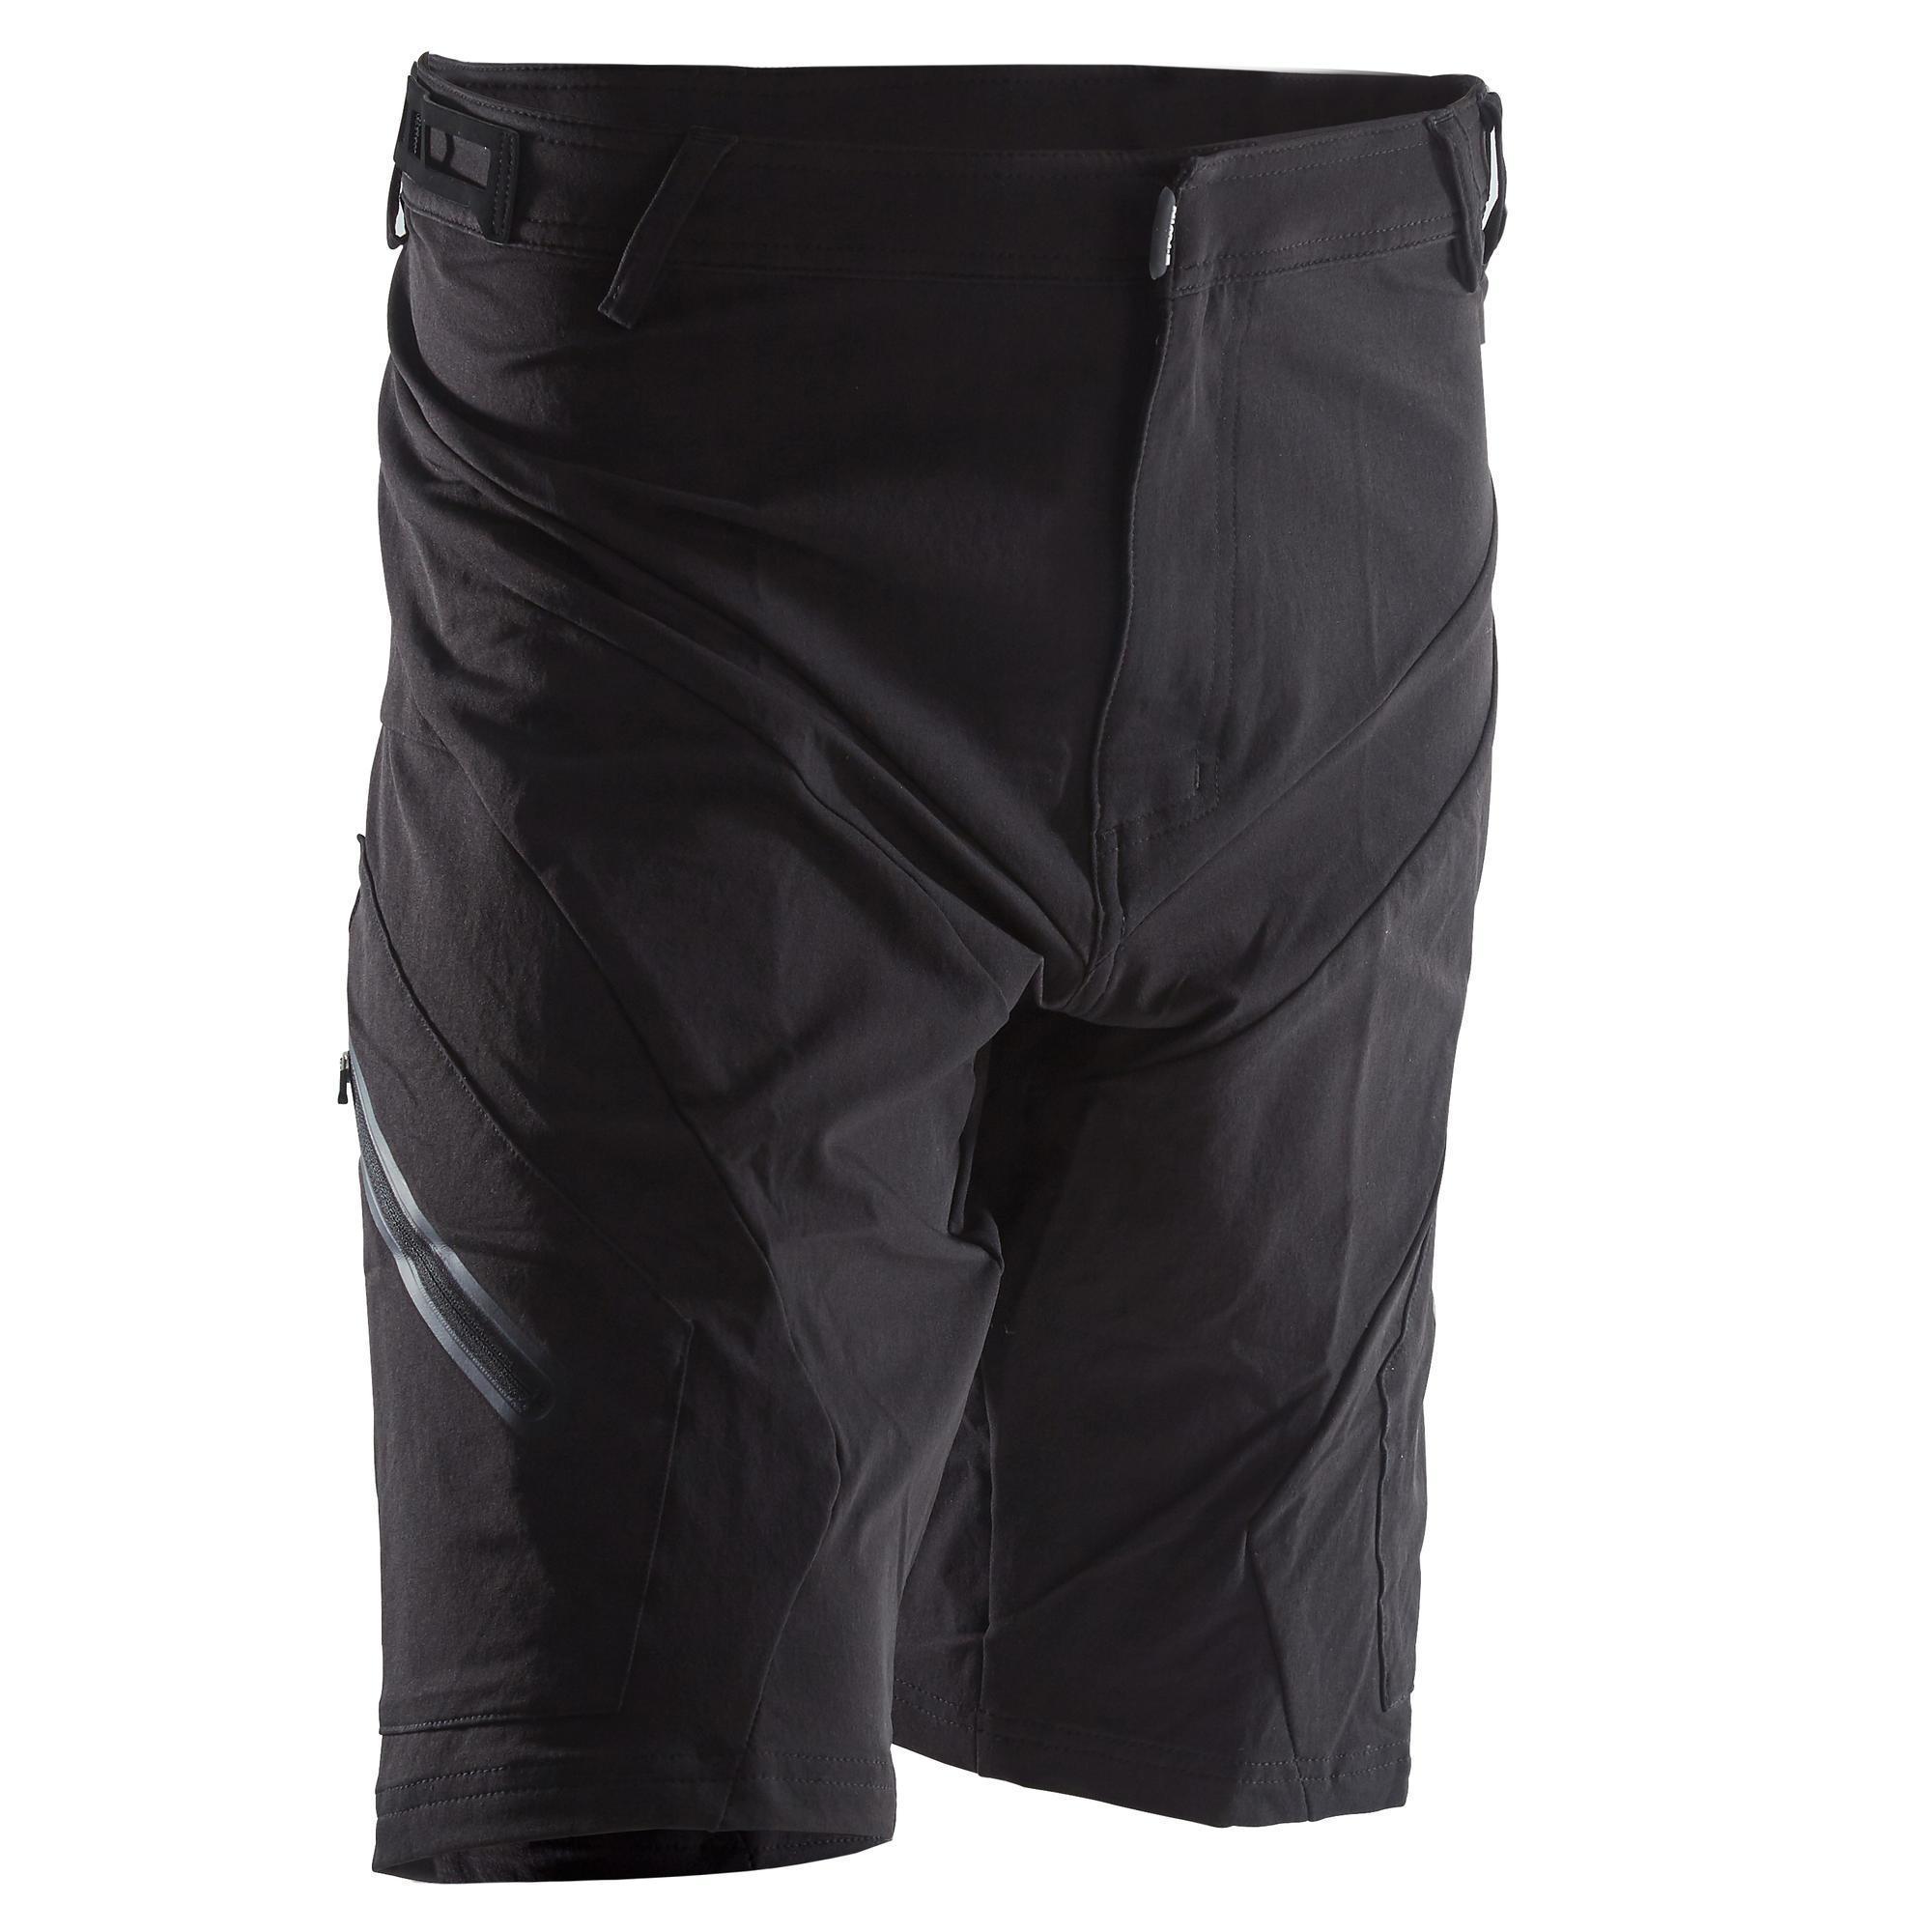 Neuankömmling Schuhwerk schnelle Farbe Mountainbike-Shorts ST 900 MTB Herren